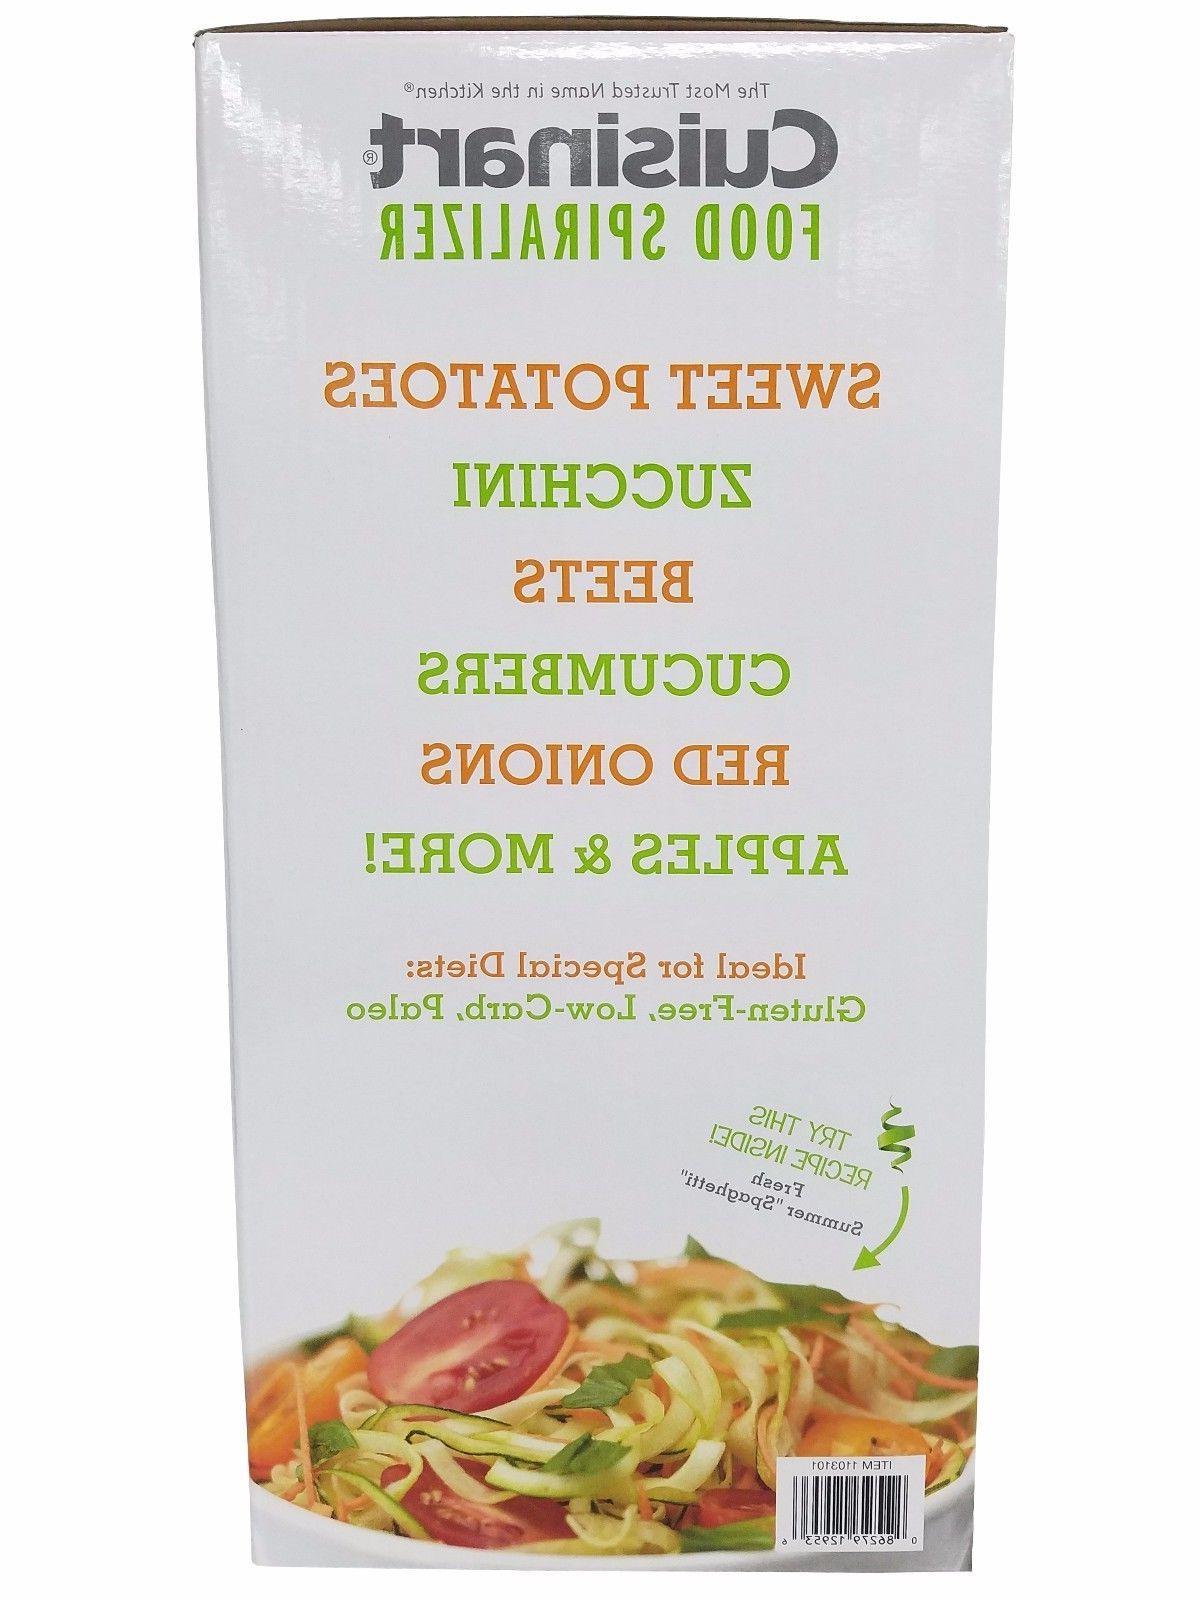 Cuisinart Food 3 Cutting Free Safe